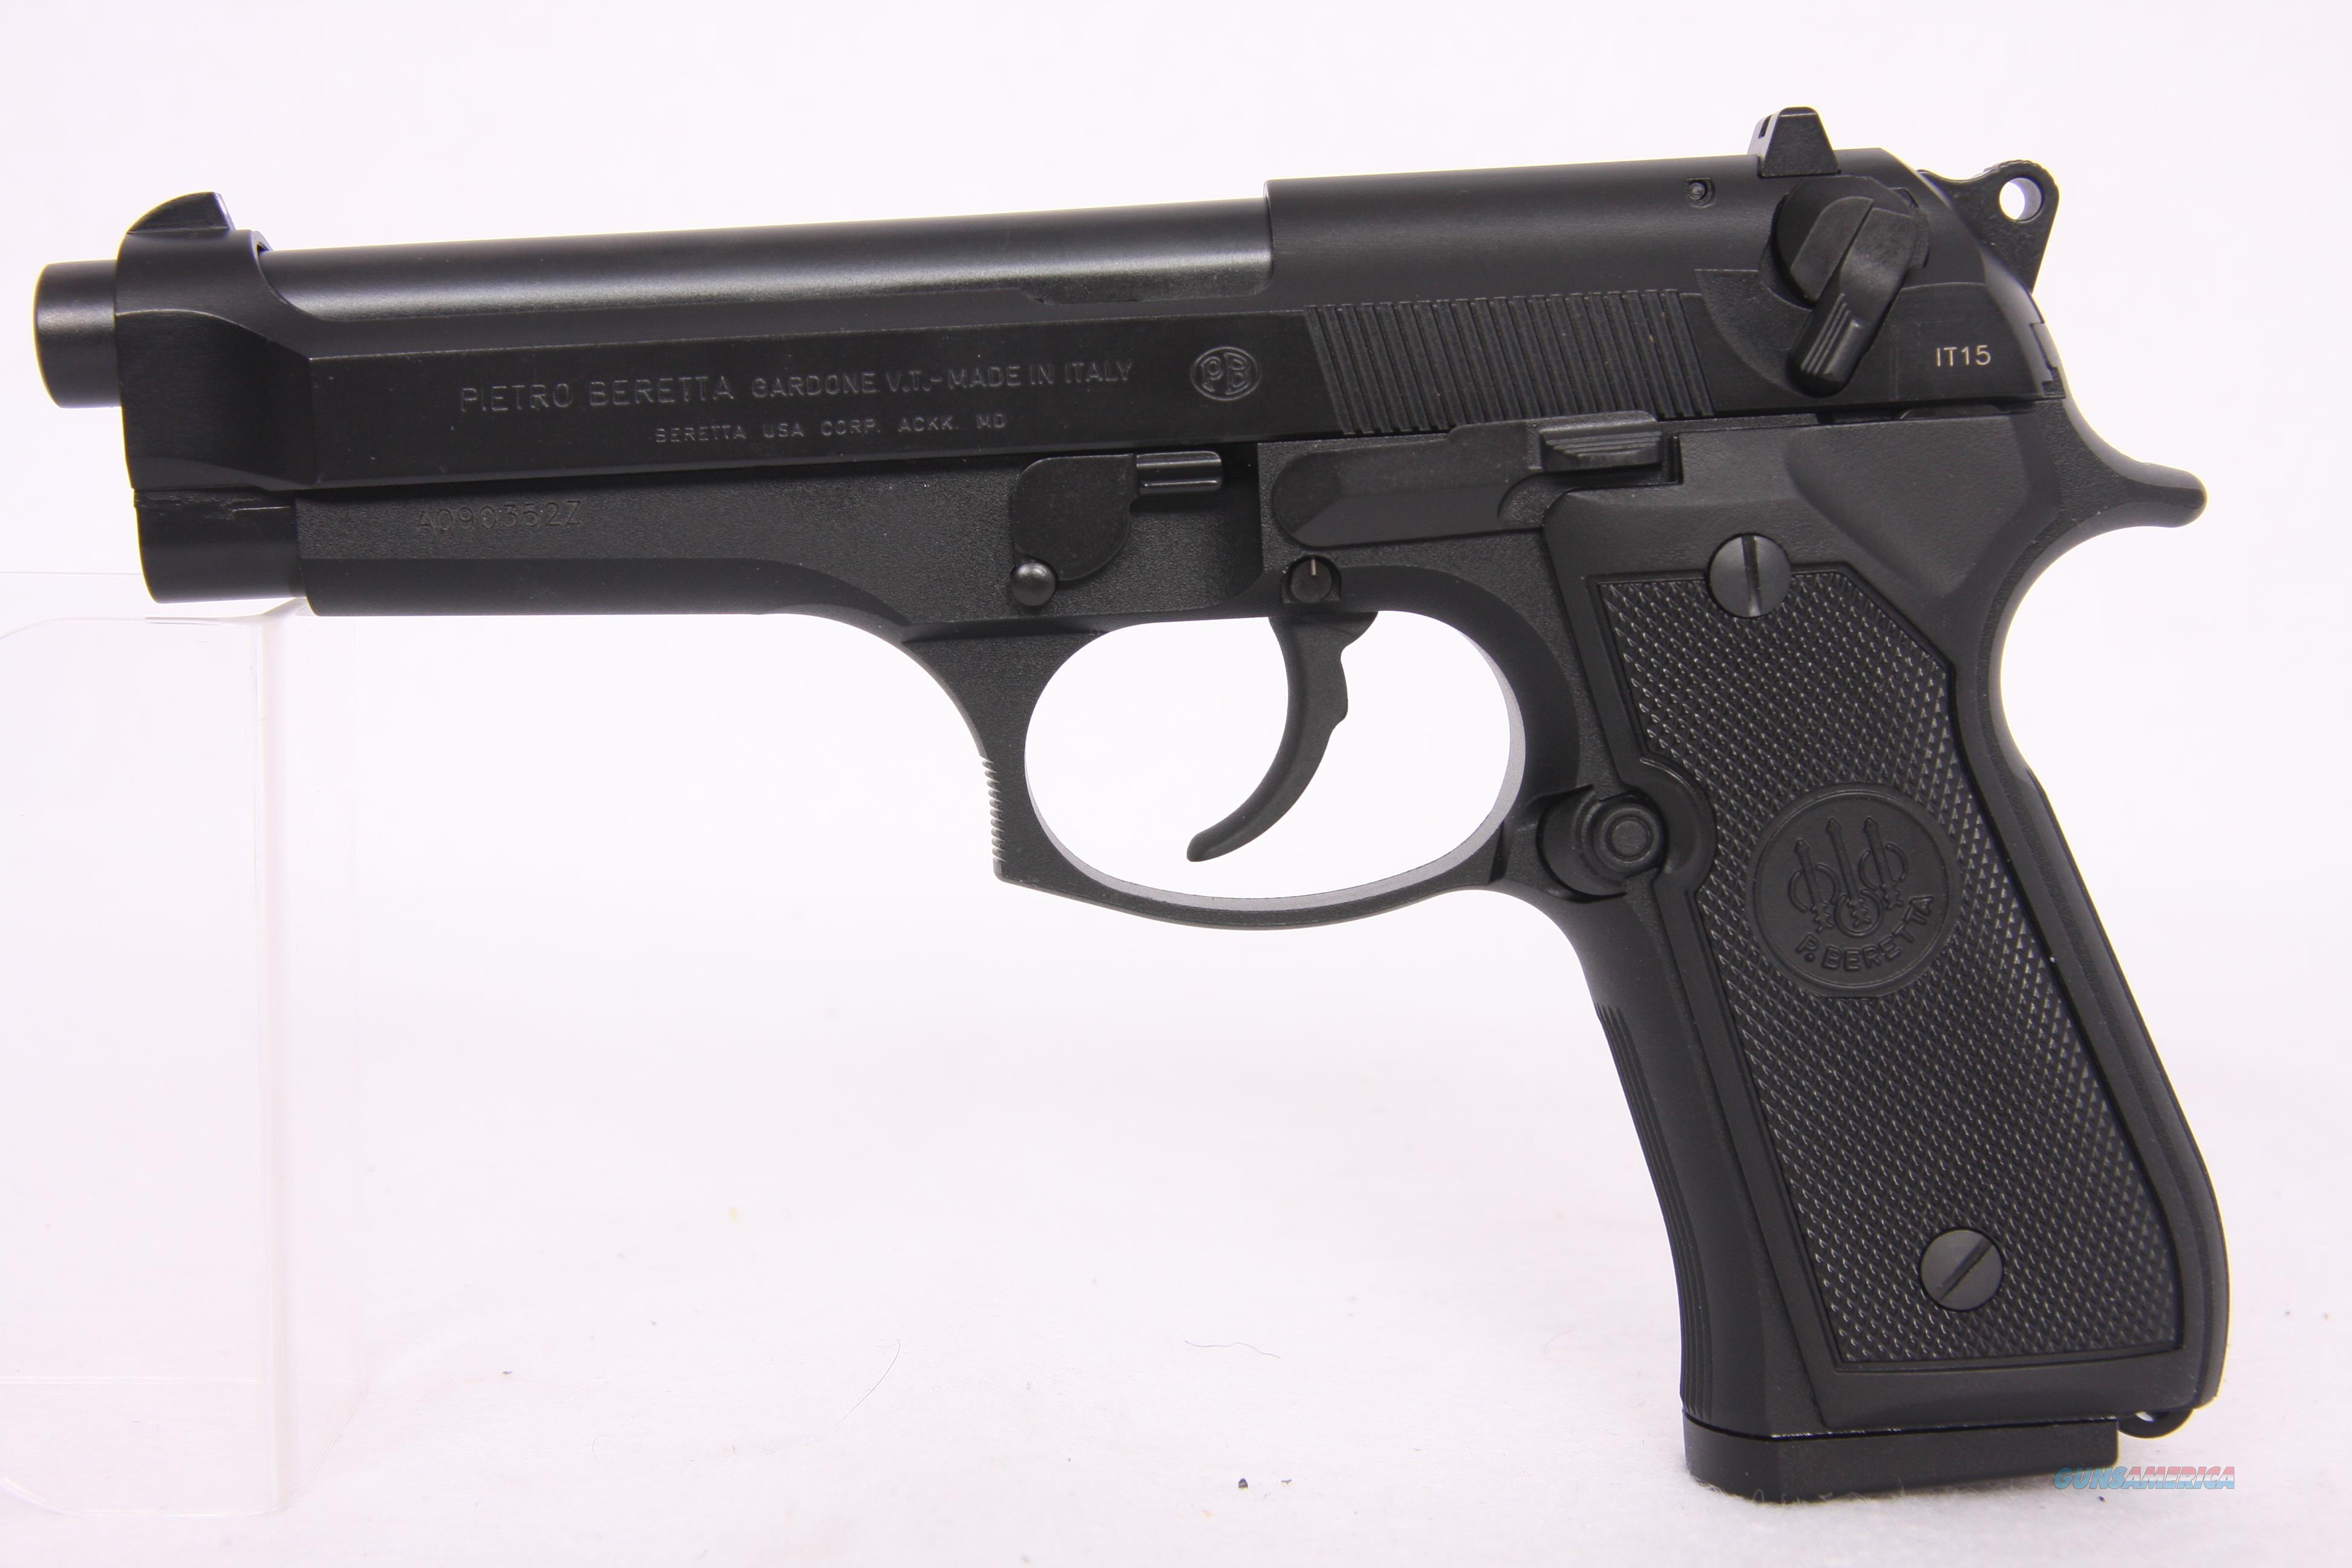 Beretta 92 9mm Blued  Guns > Pistols > Beretta Pistols > Model 92 Series